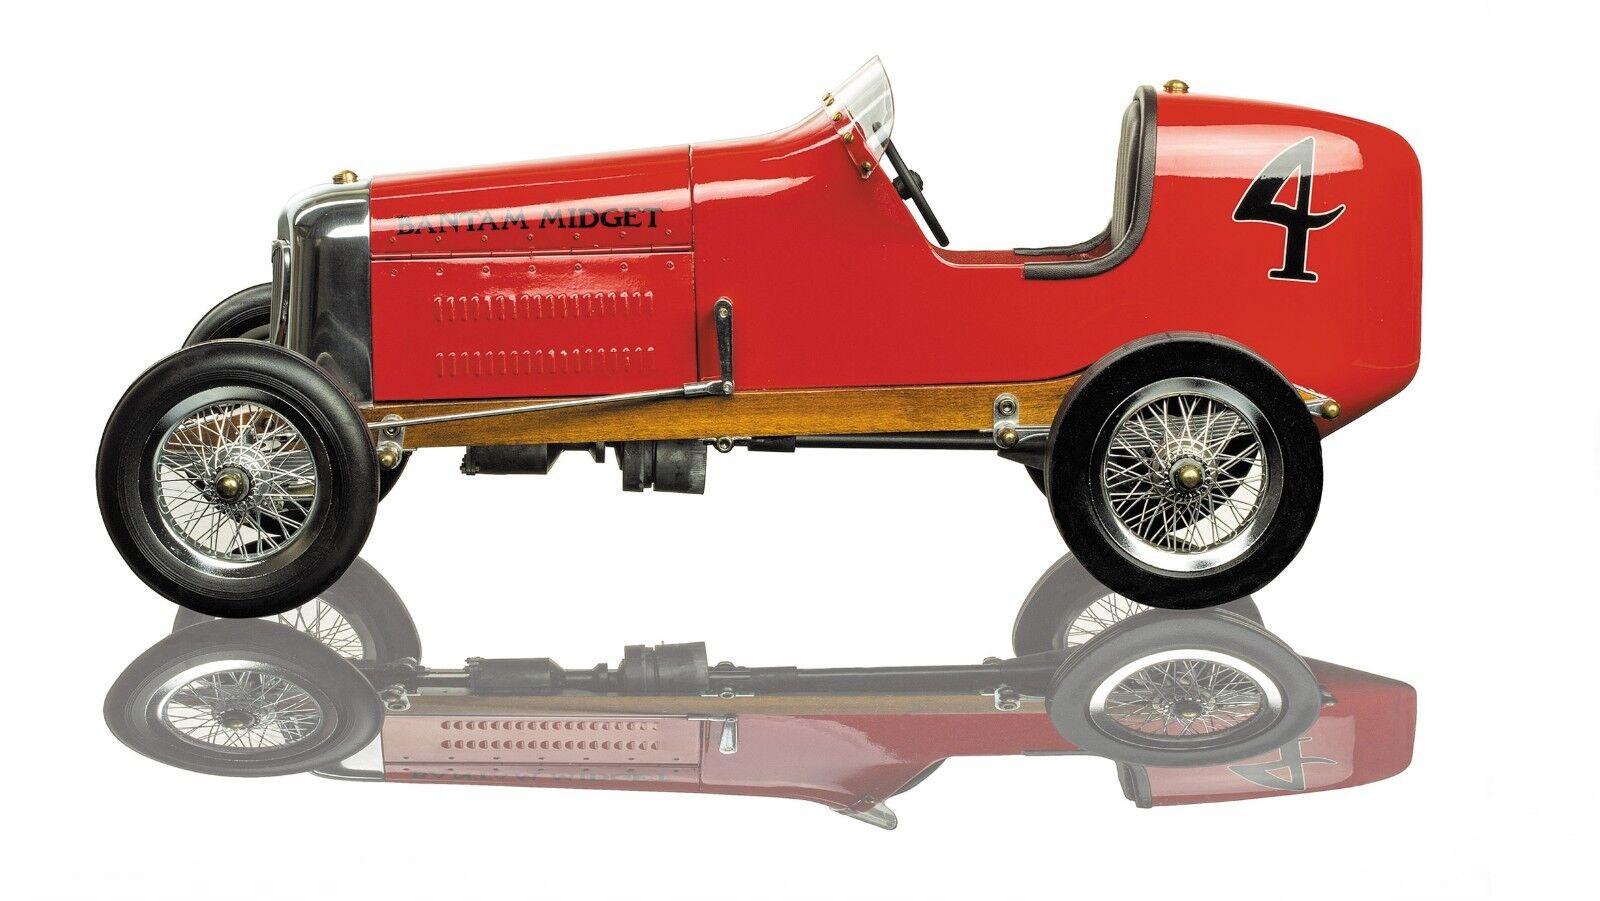 BANTAM MIDGET VINTAGE RACING CAR RED BODY, TETHER RACER, AUTHENTIC MODELS, PCO11